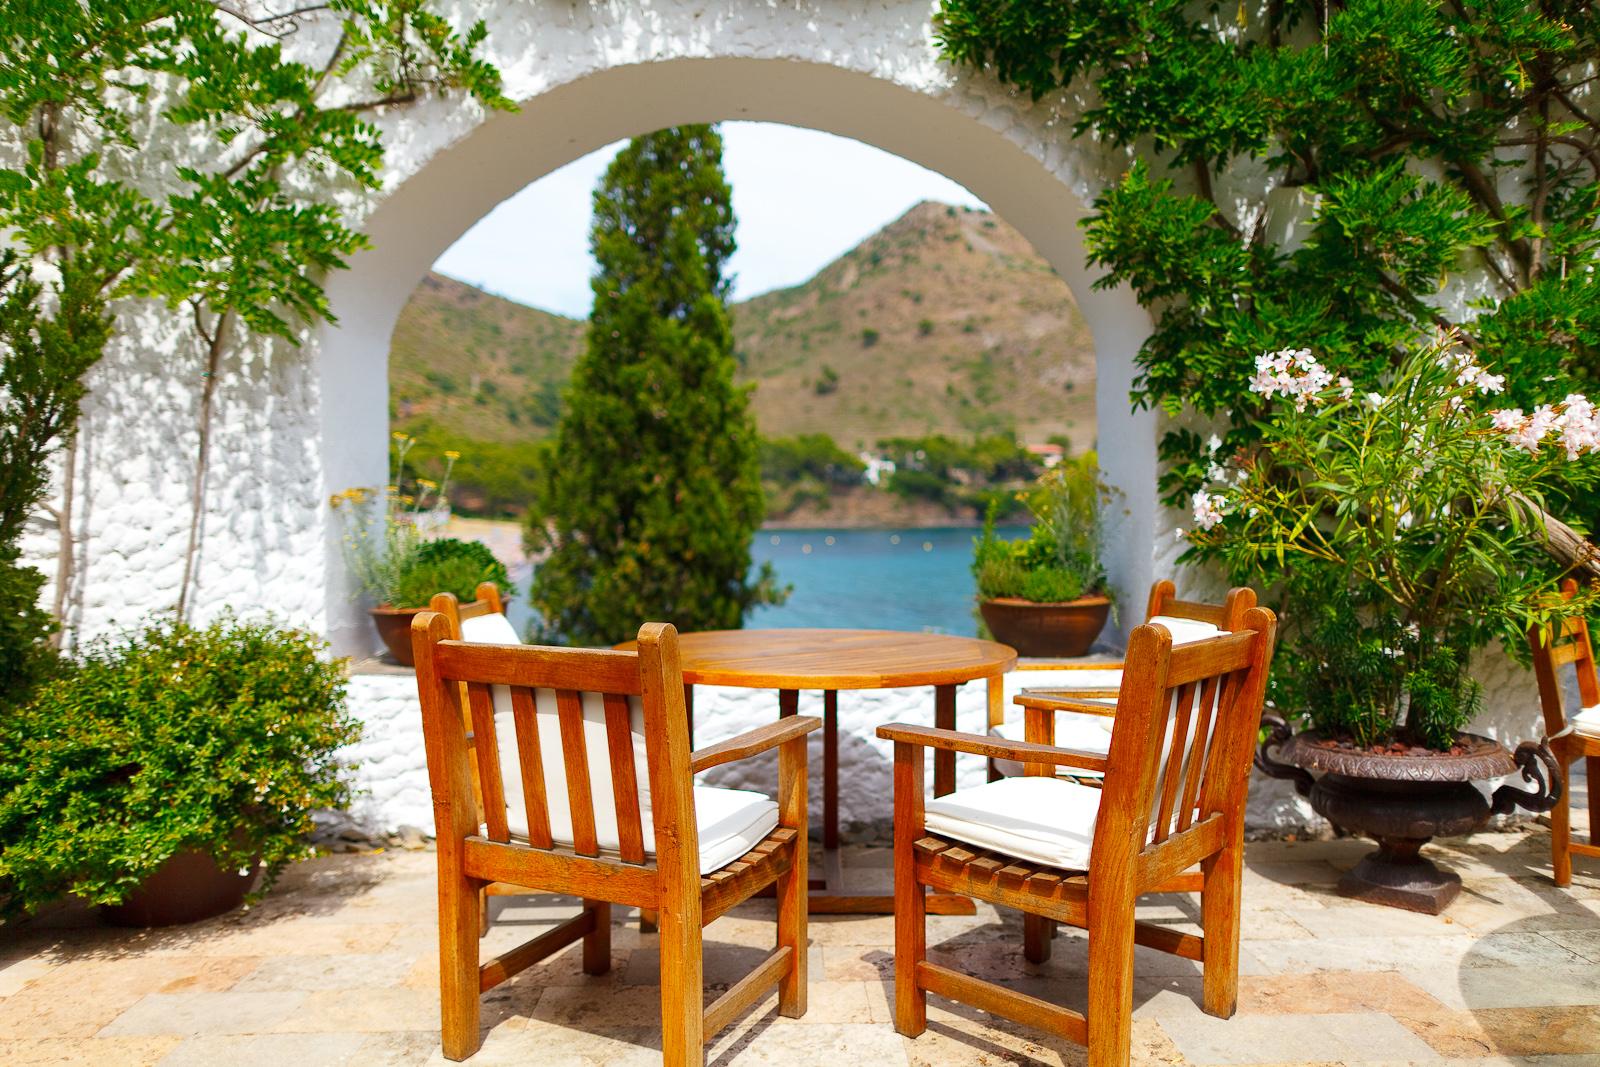 El Bulli, Spain - Taking a break on the terrace before the meat courses